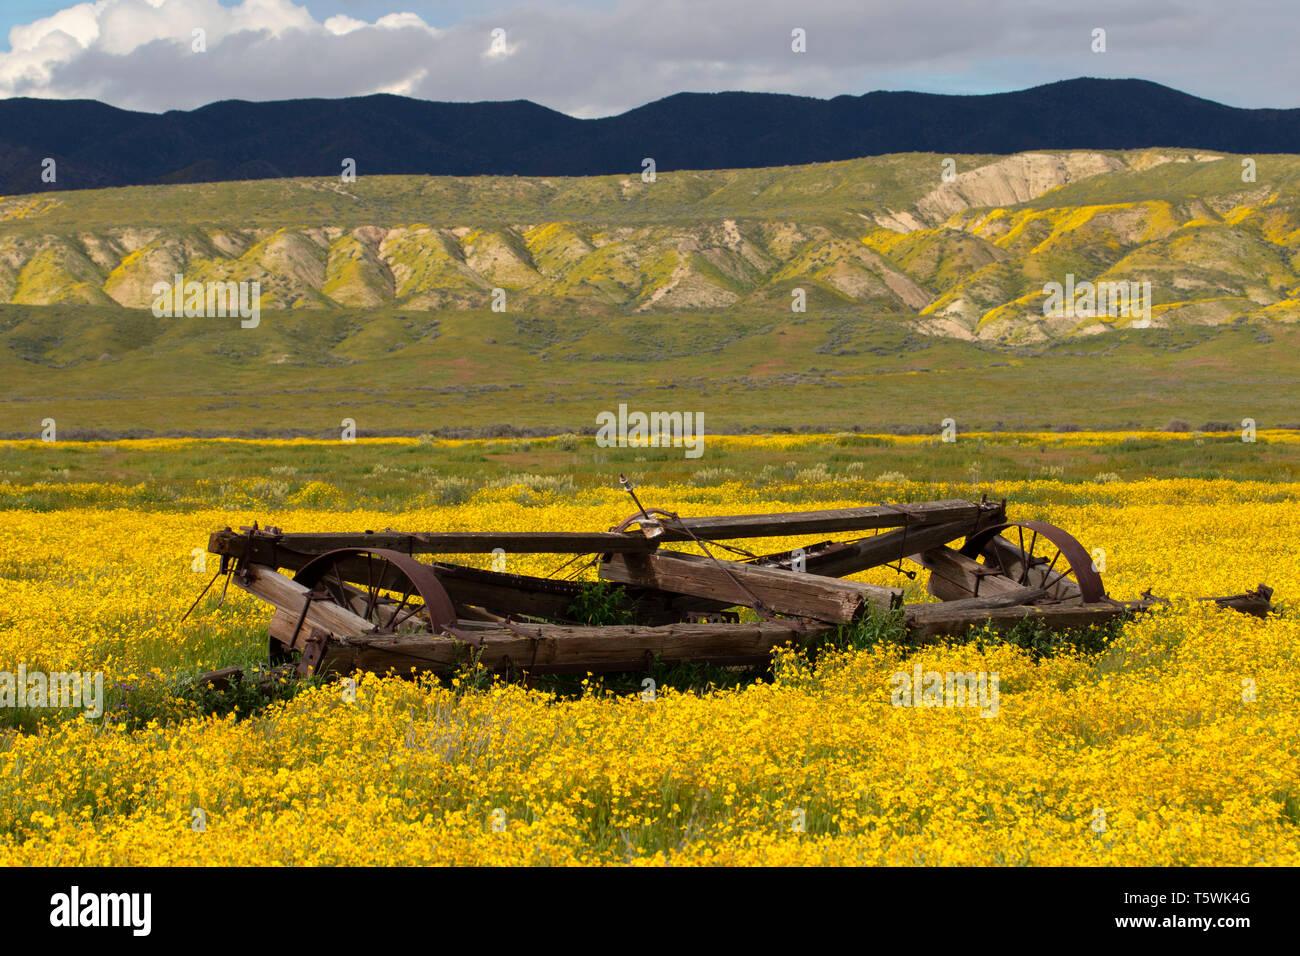 Rustic ranching equipment, Carrizo Plain National Monument, California Stock Photo